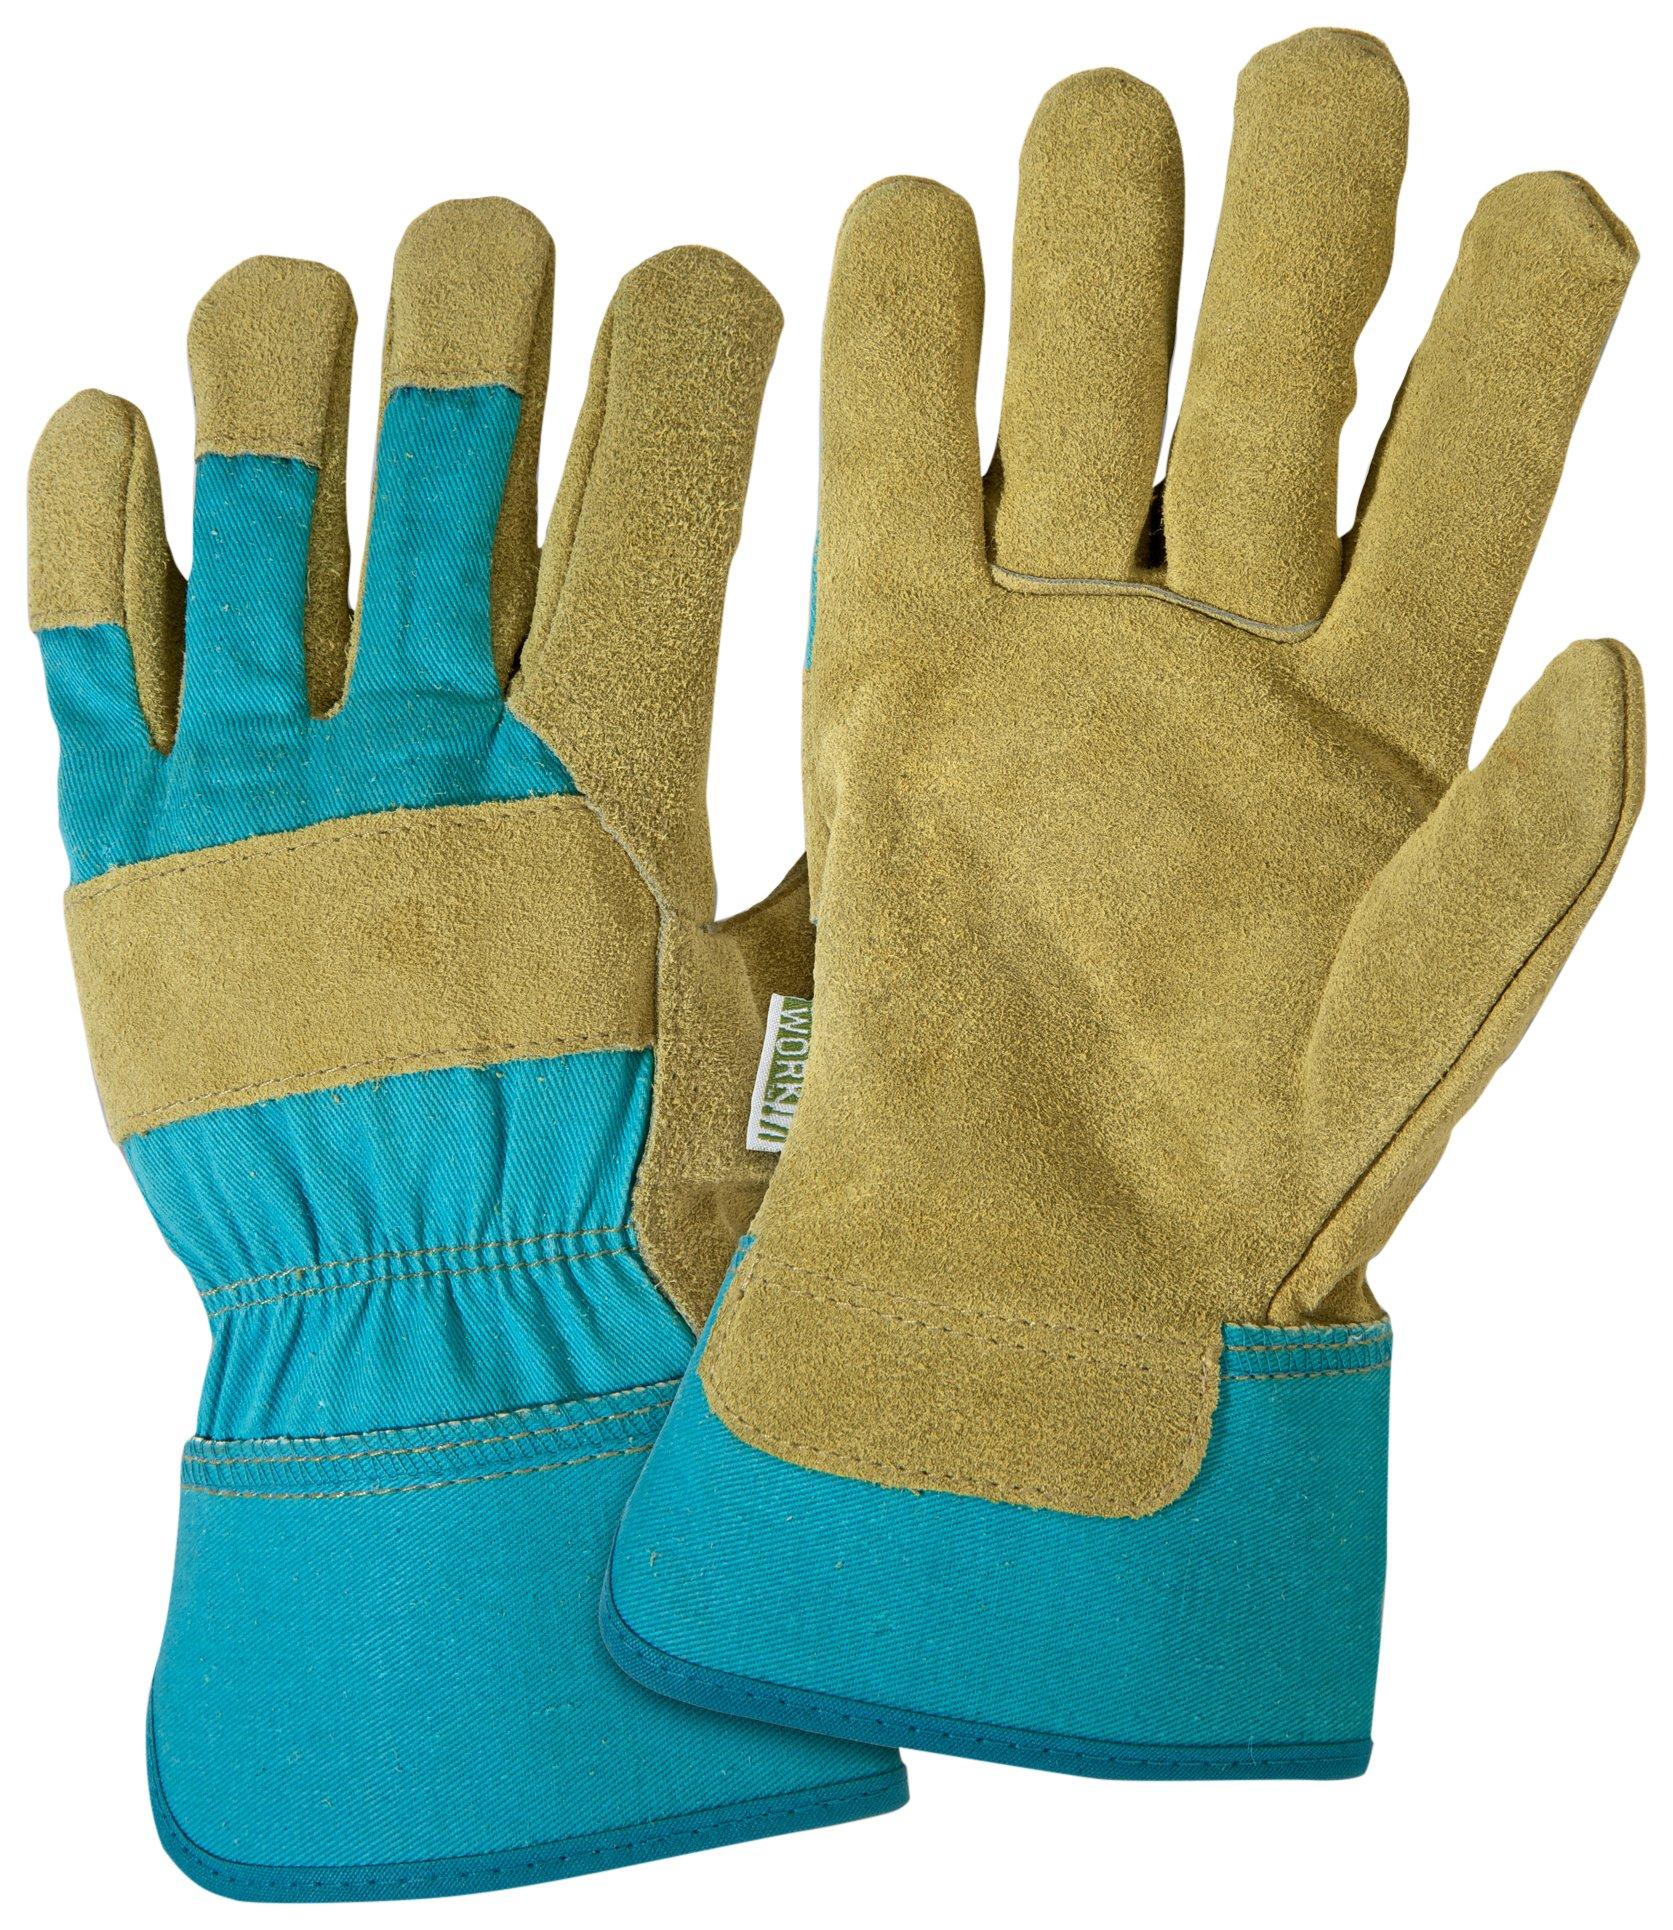 DIRTY WORK DW23000 Split Cowhide Leather Landscaping Work Gloves: Women's Medium/Large, 1 Pair